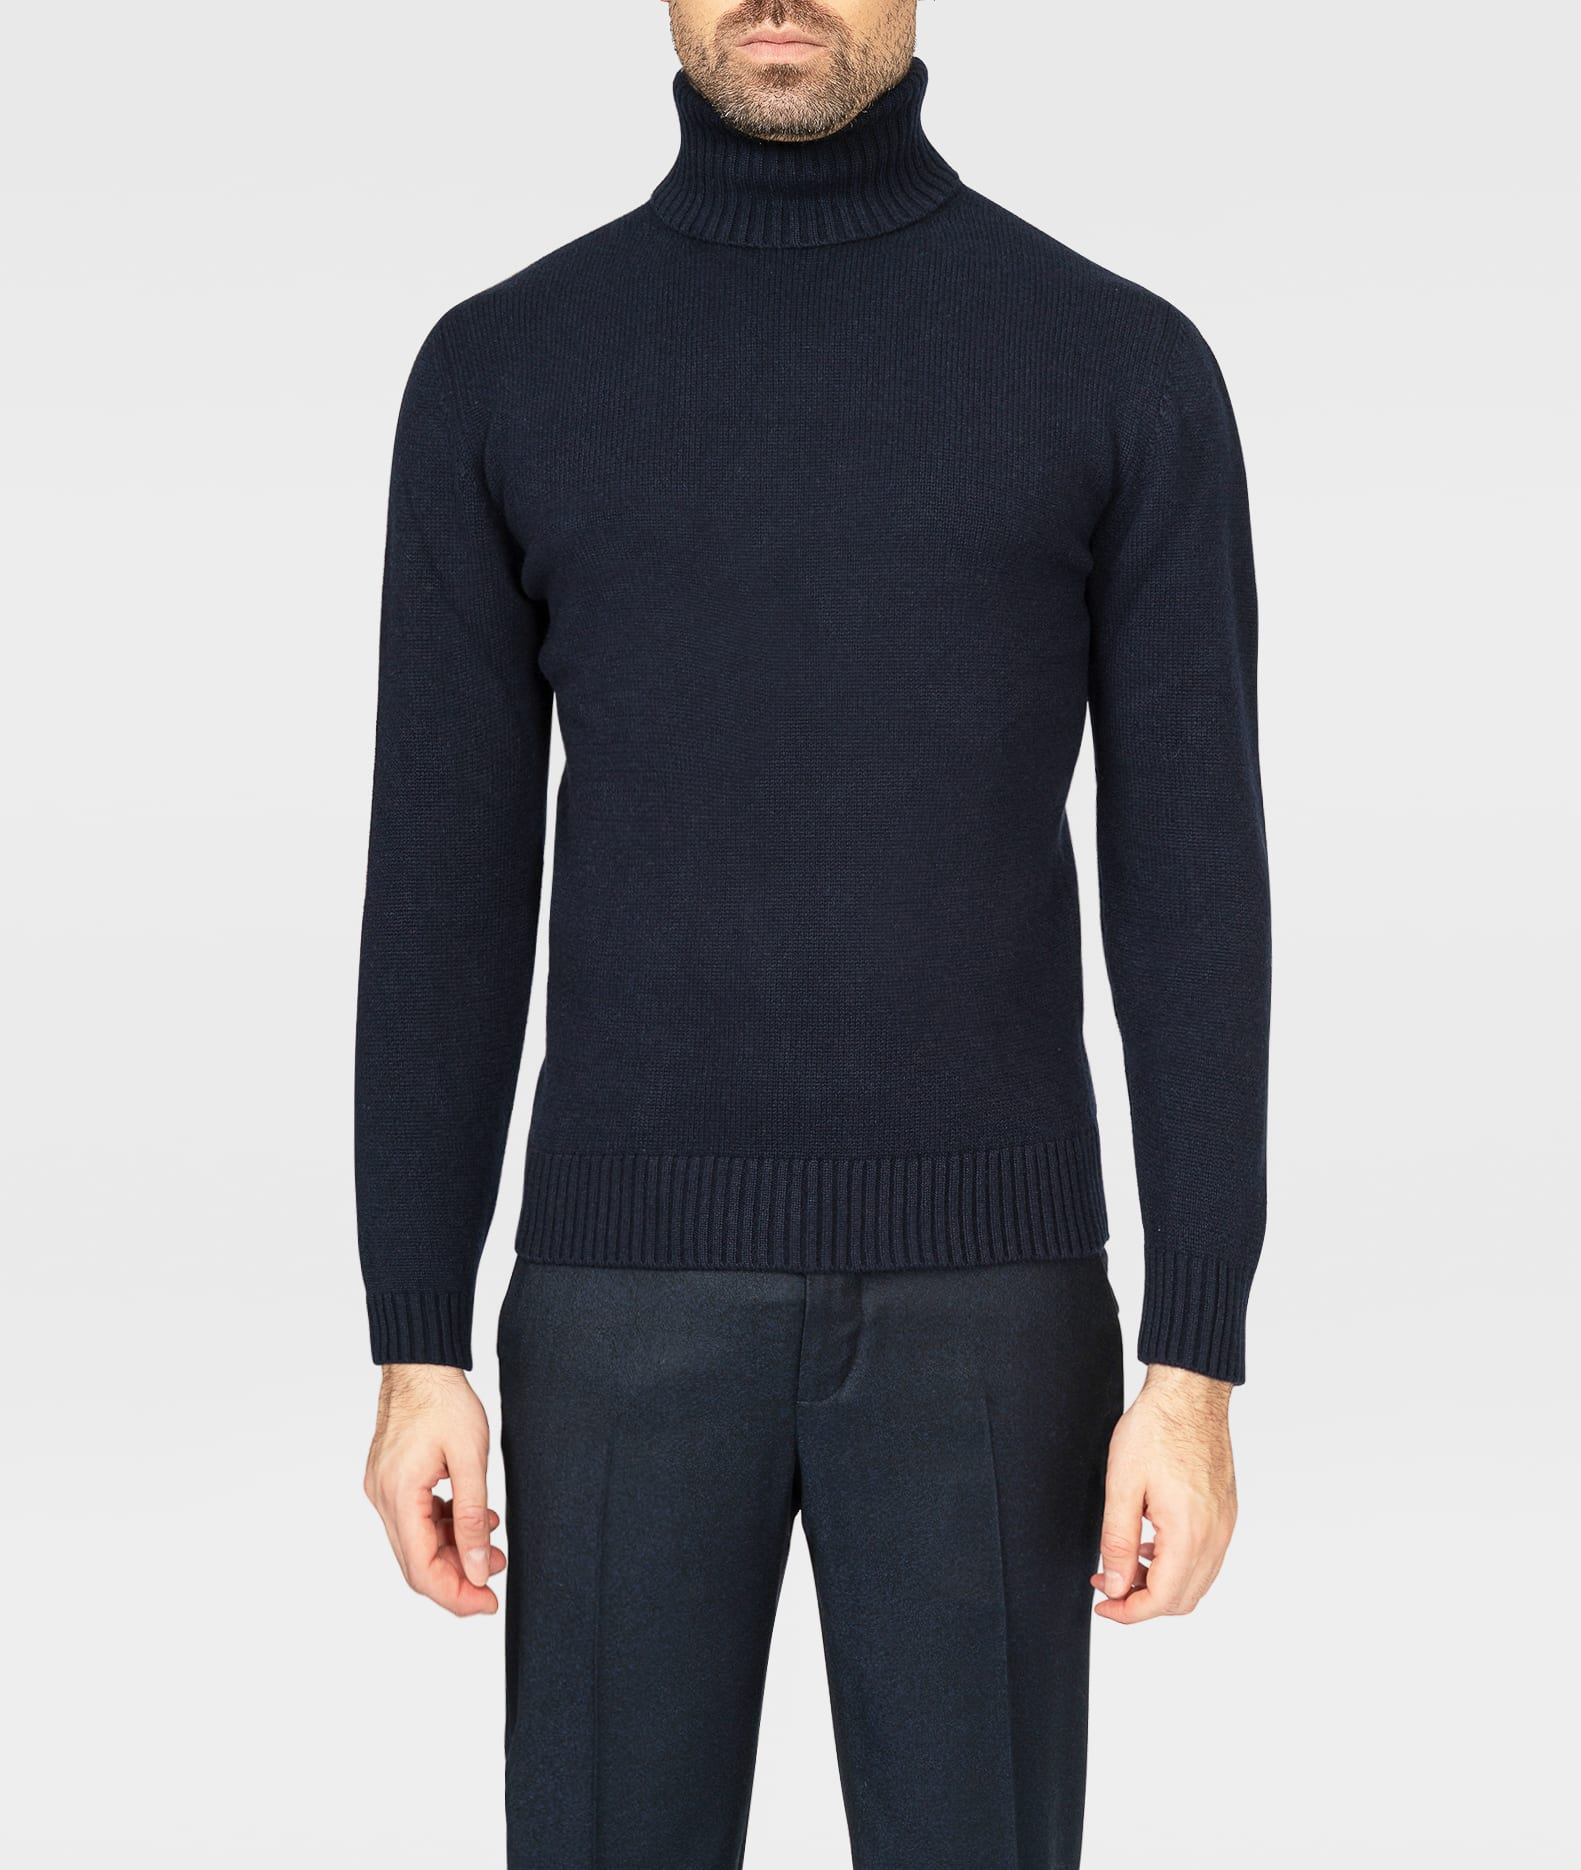 Turtleneck Sweater diablerets